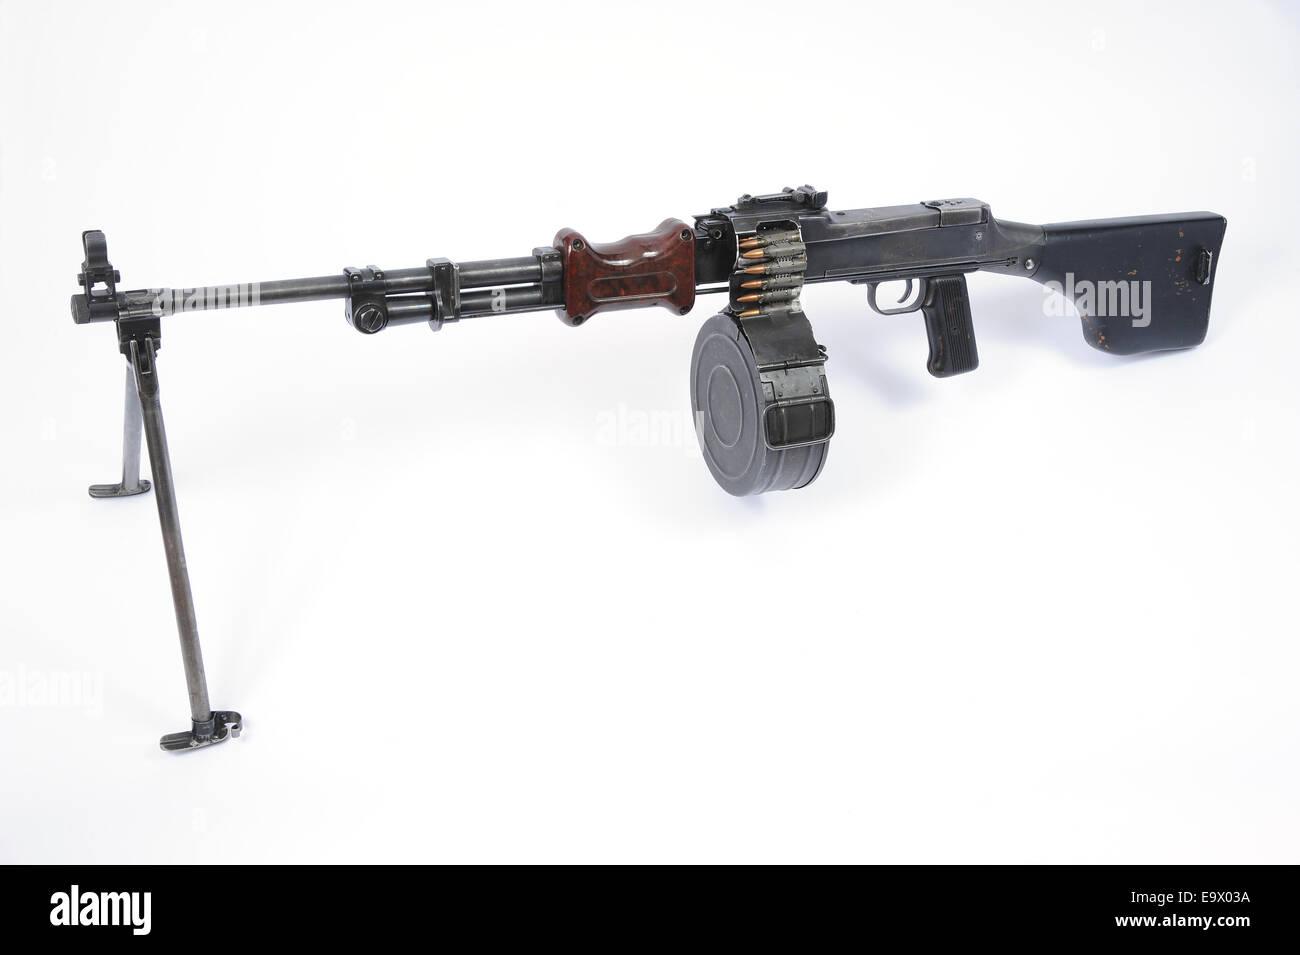 Russian RPD machine gun - Stock Image